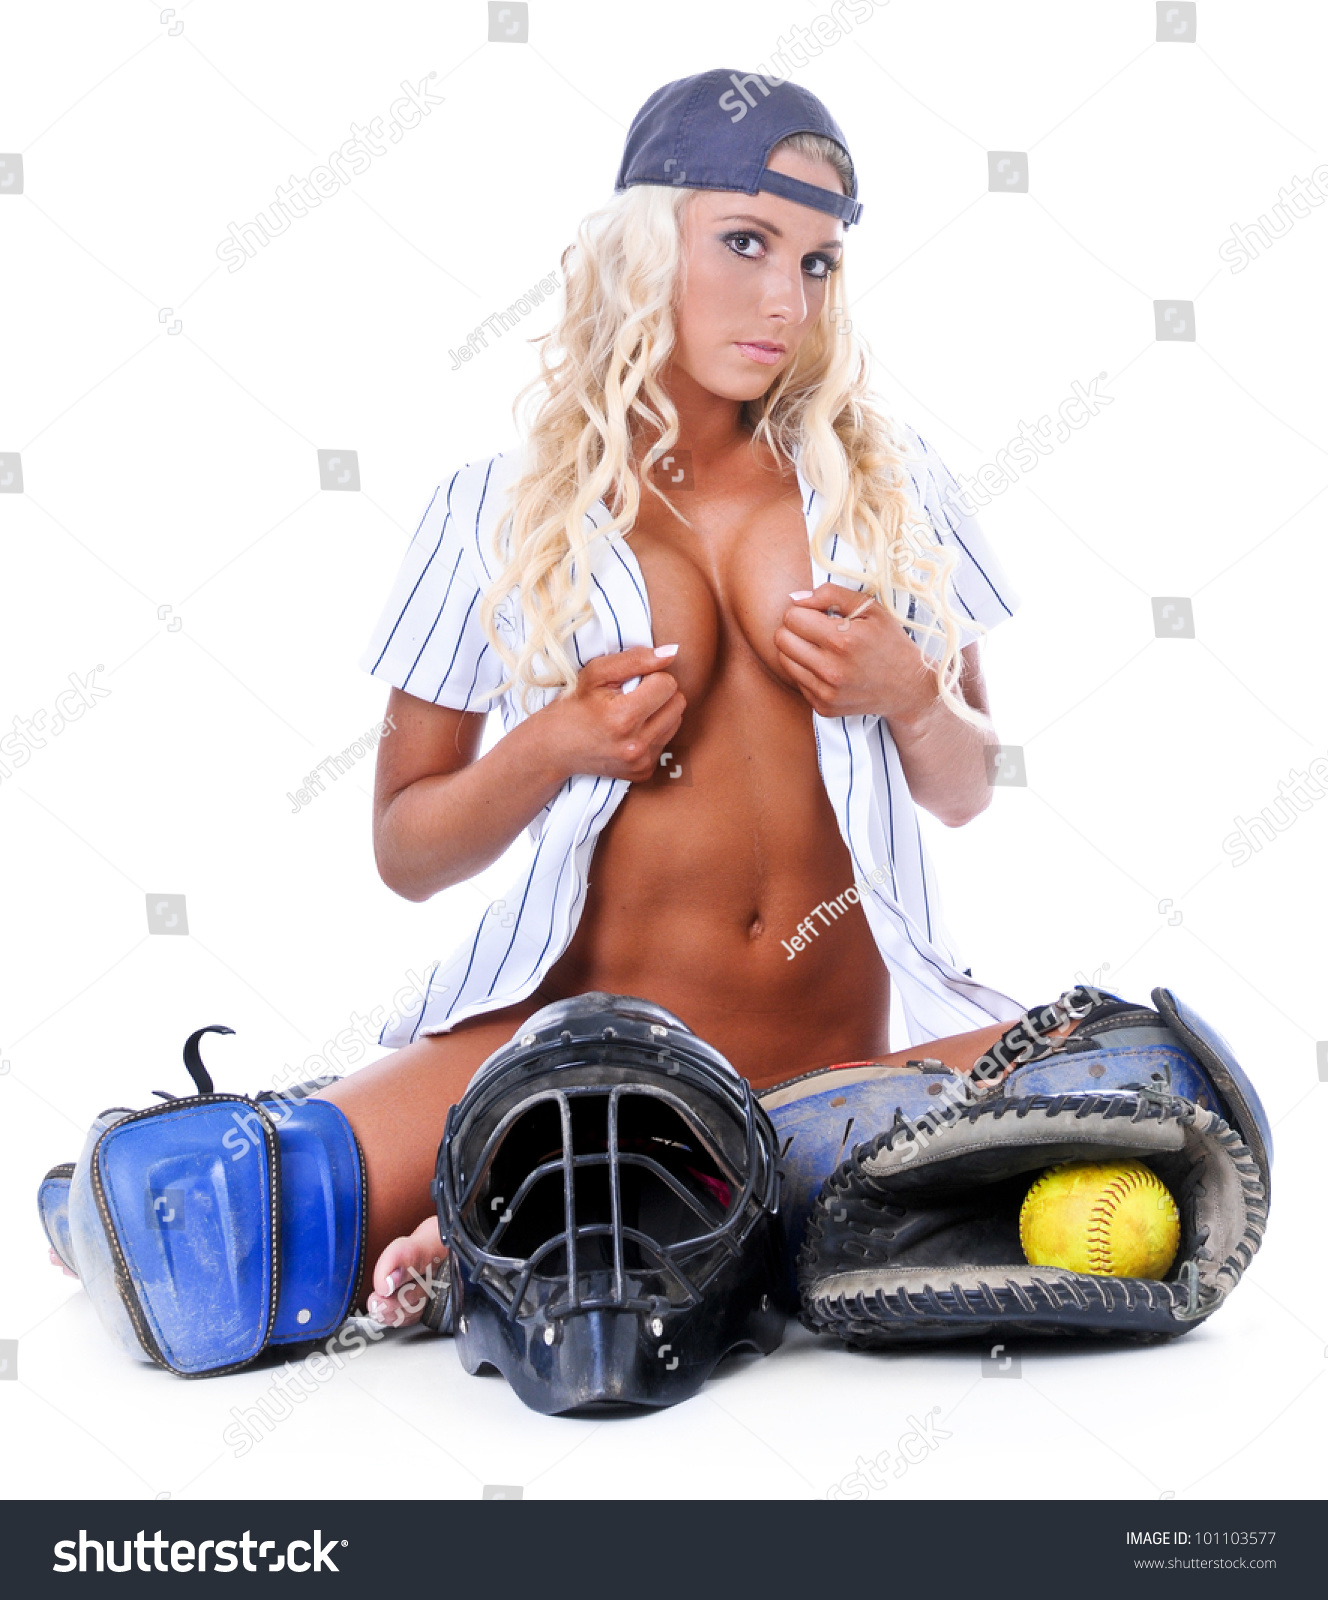 Remarkable, nude girls wearing baseball cap congratulate, you